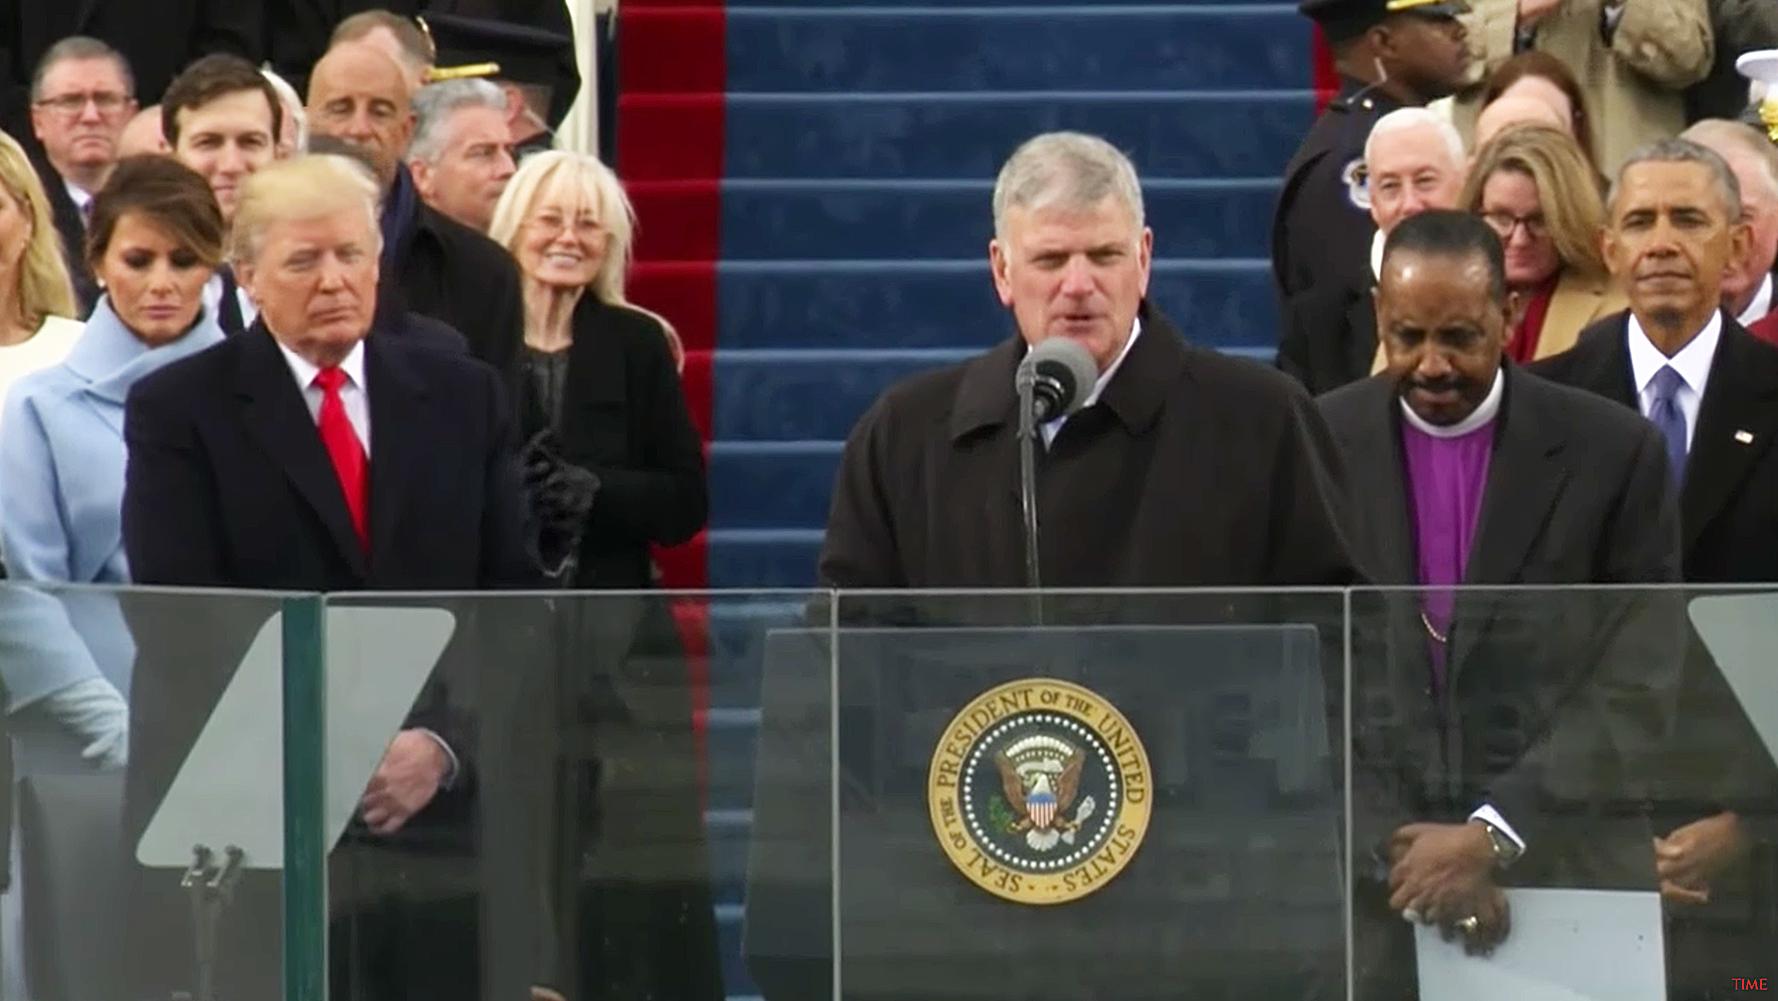 Melania Trump scowling inauguration